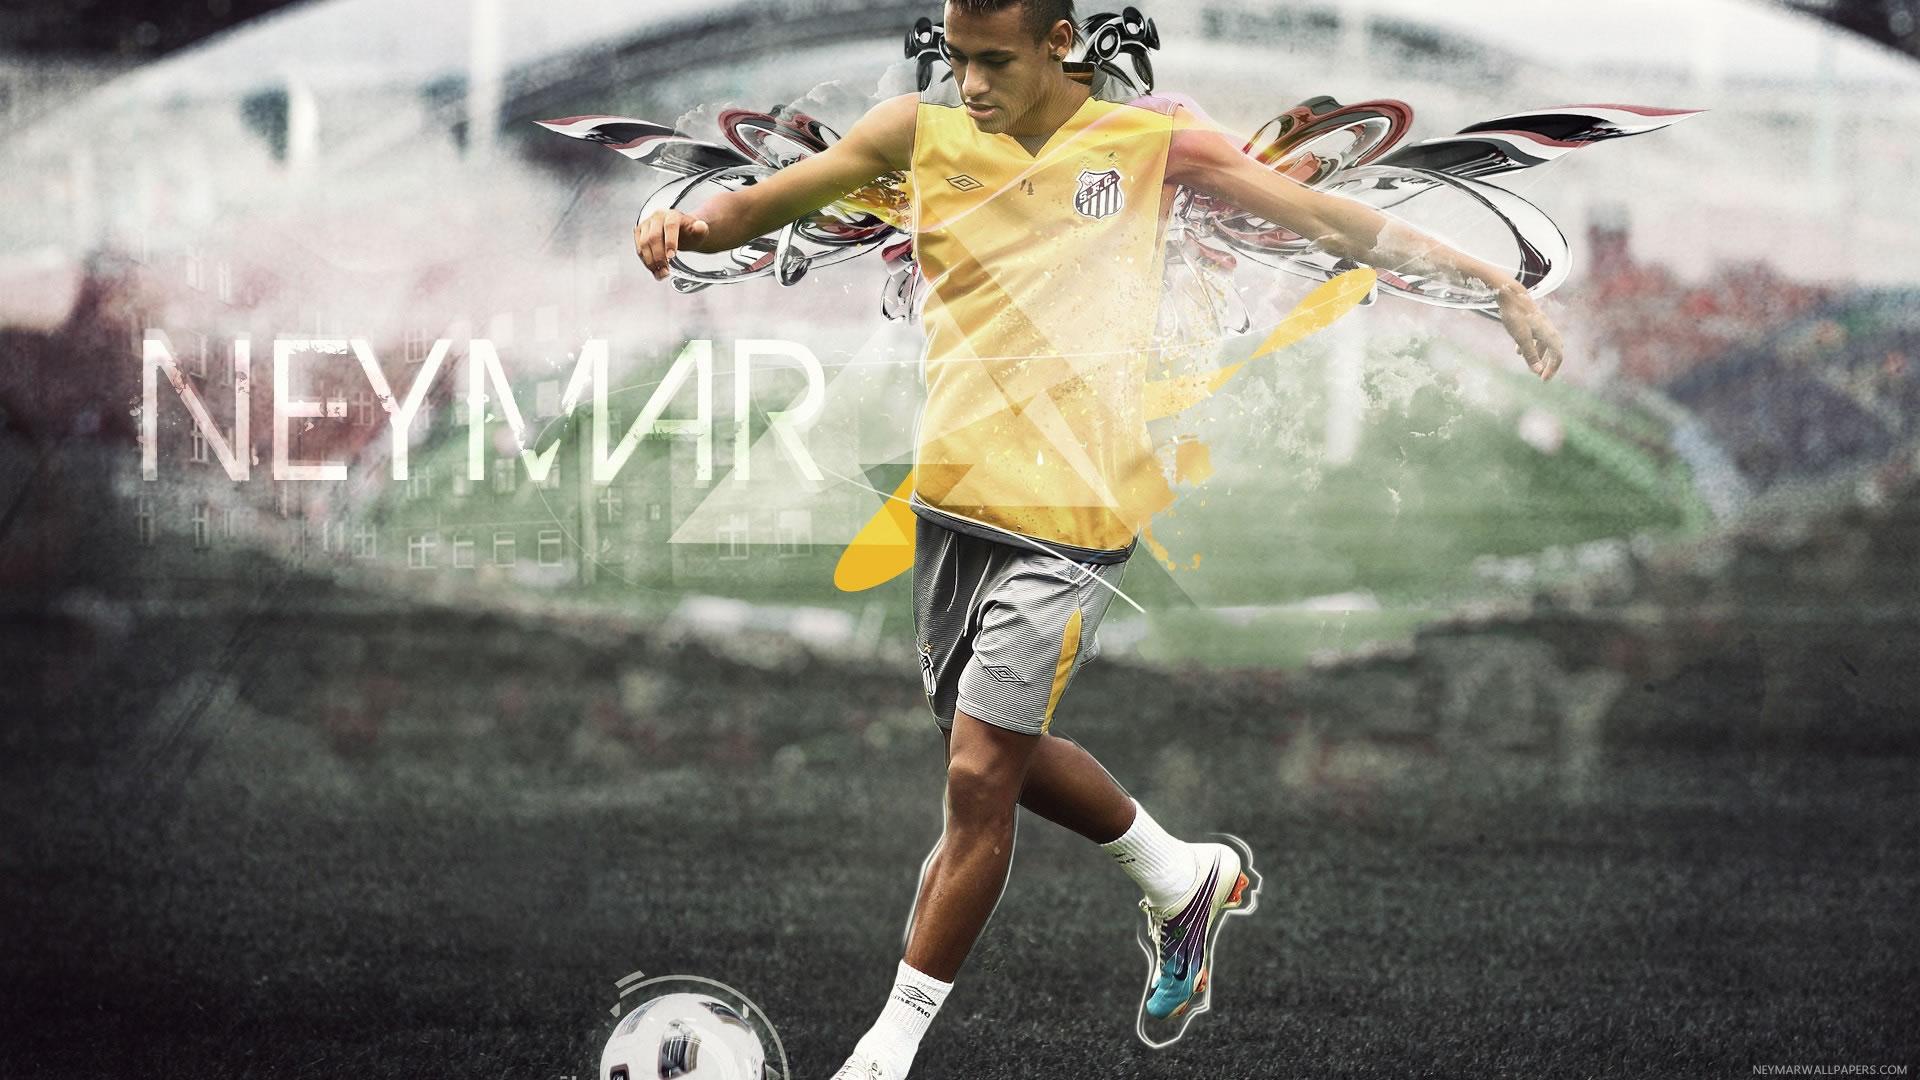 Neymar training wallpaper (3)